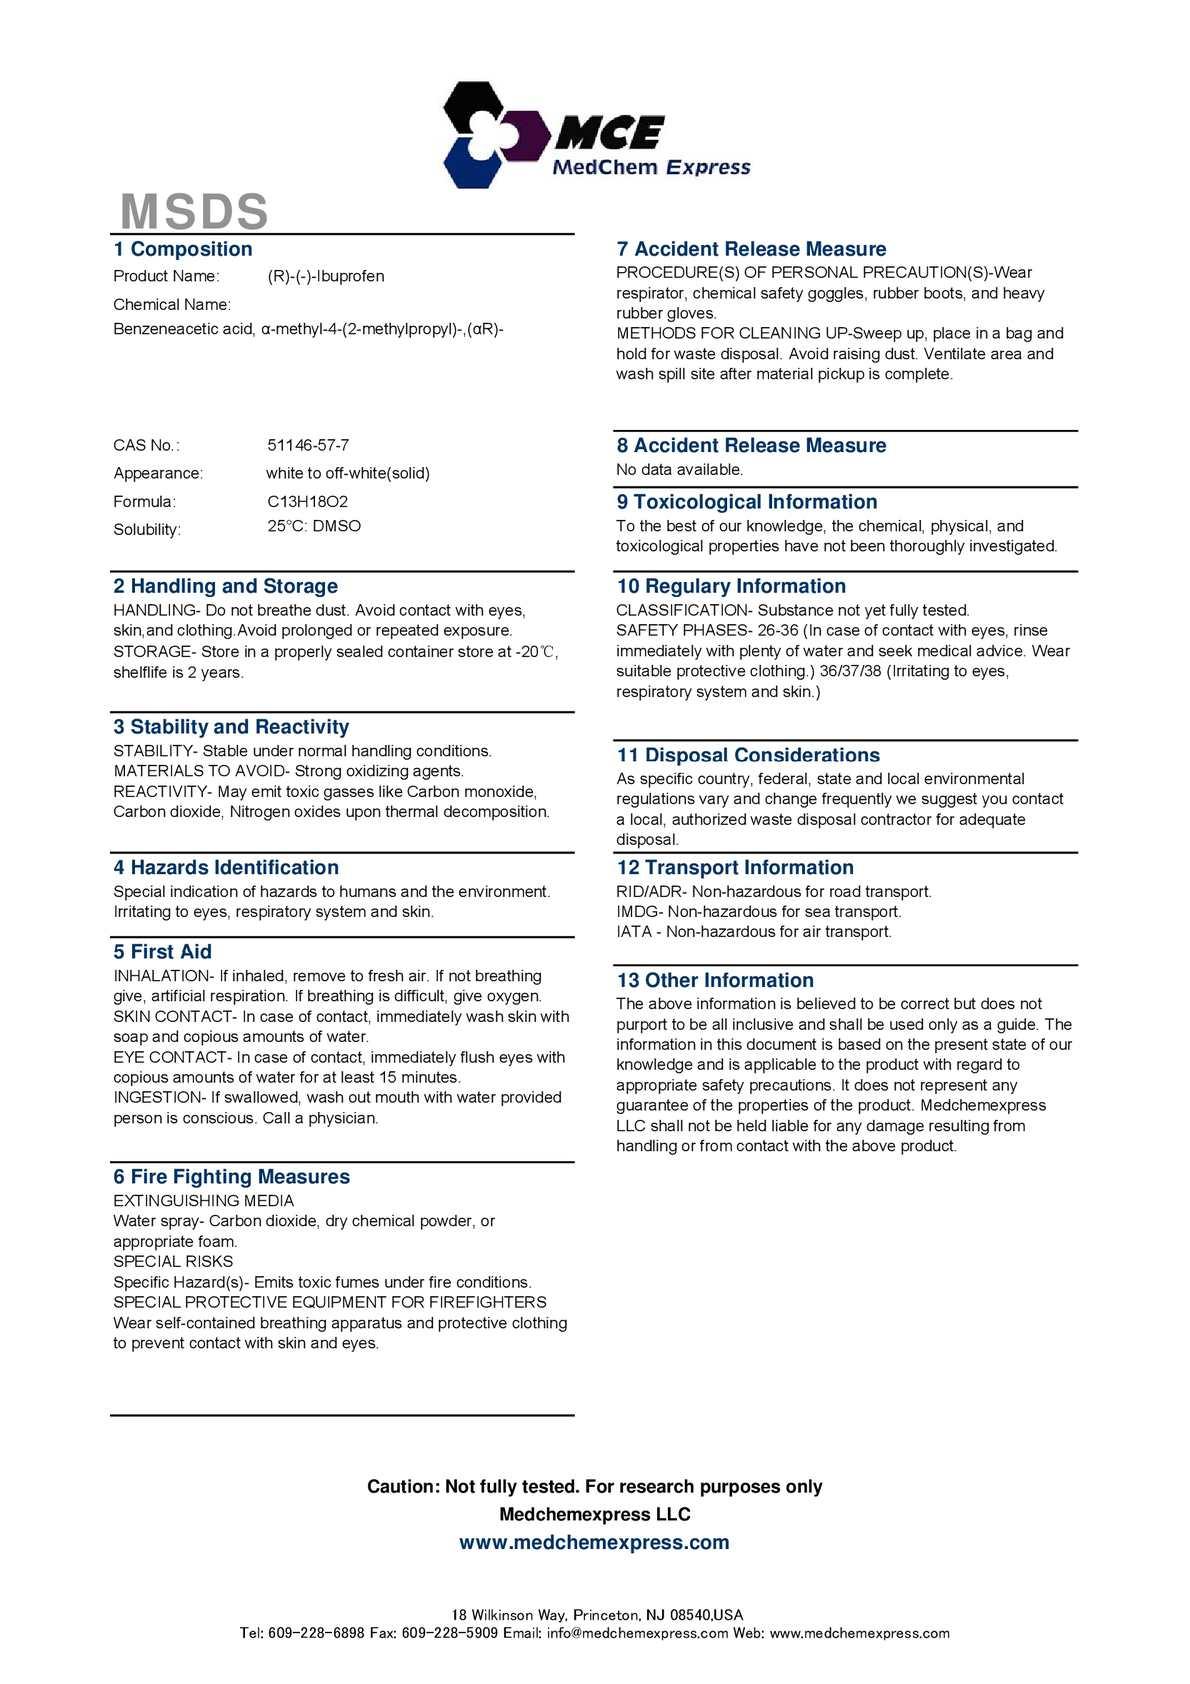 Calaméo - (R)-(-)-Ibuprofen 51146 57 7 MSDS Med Chem Express